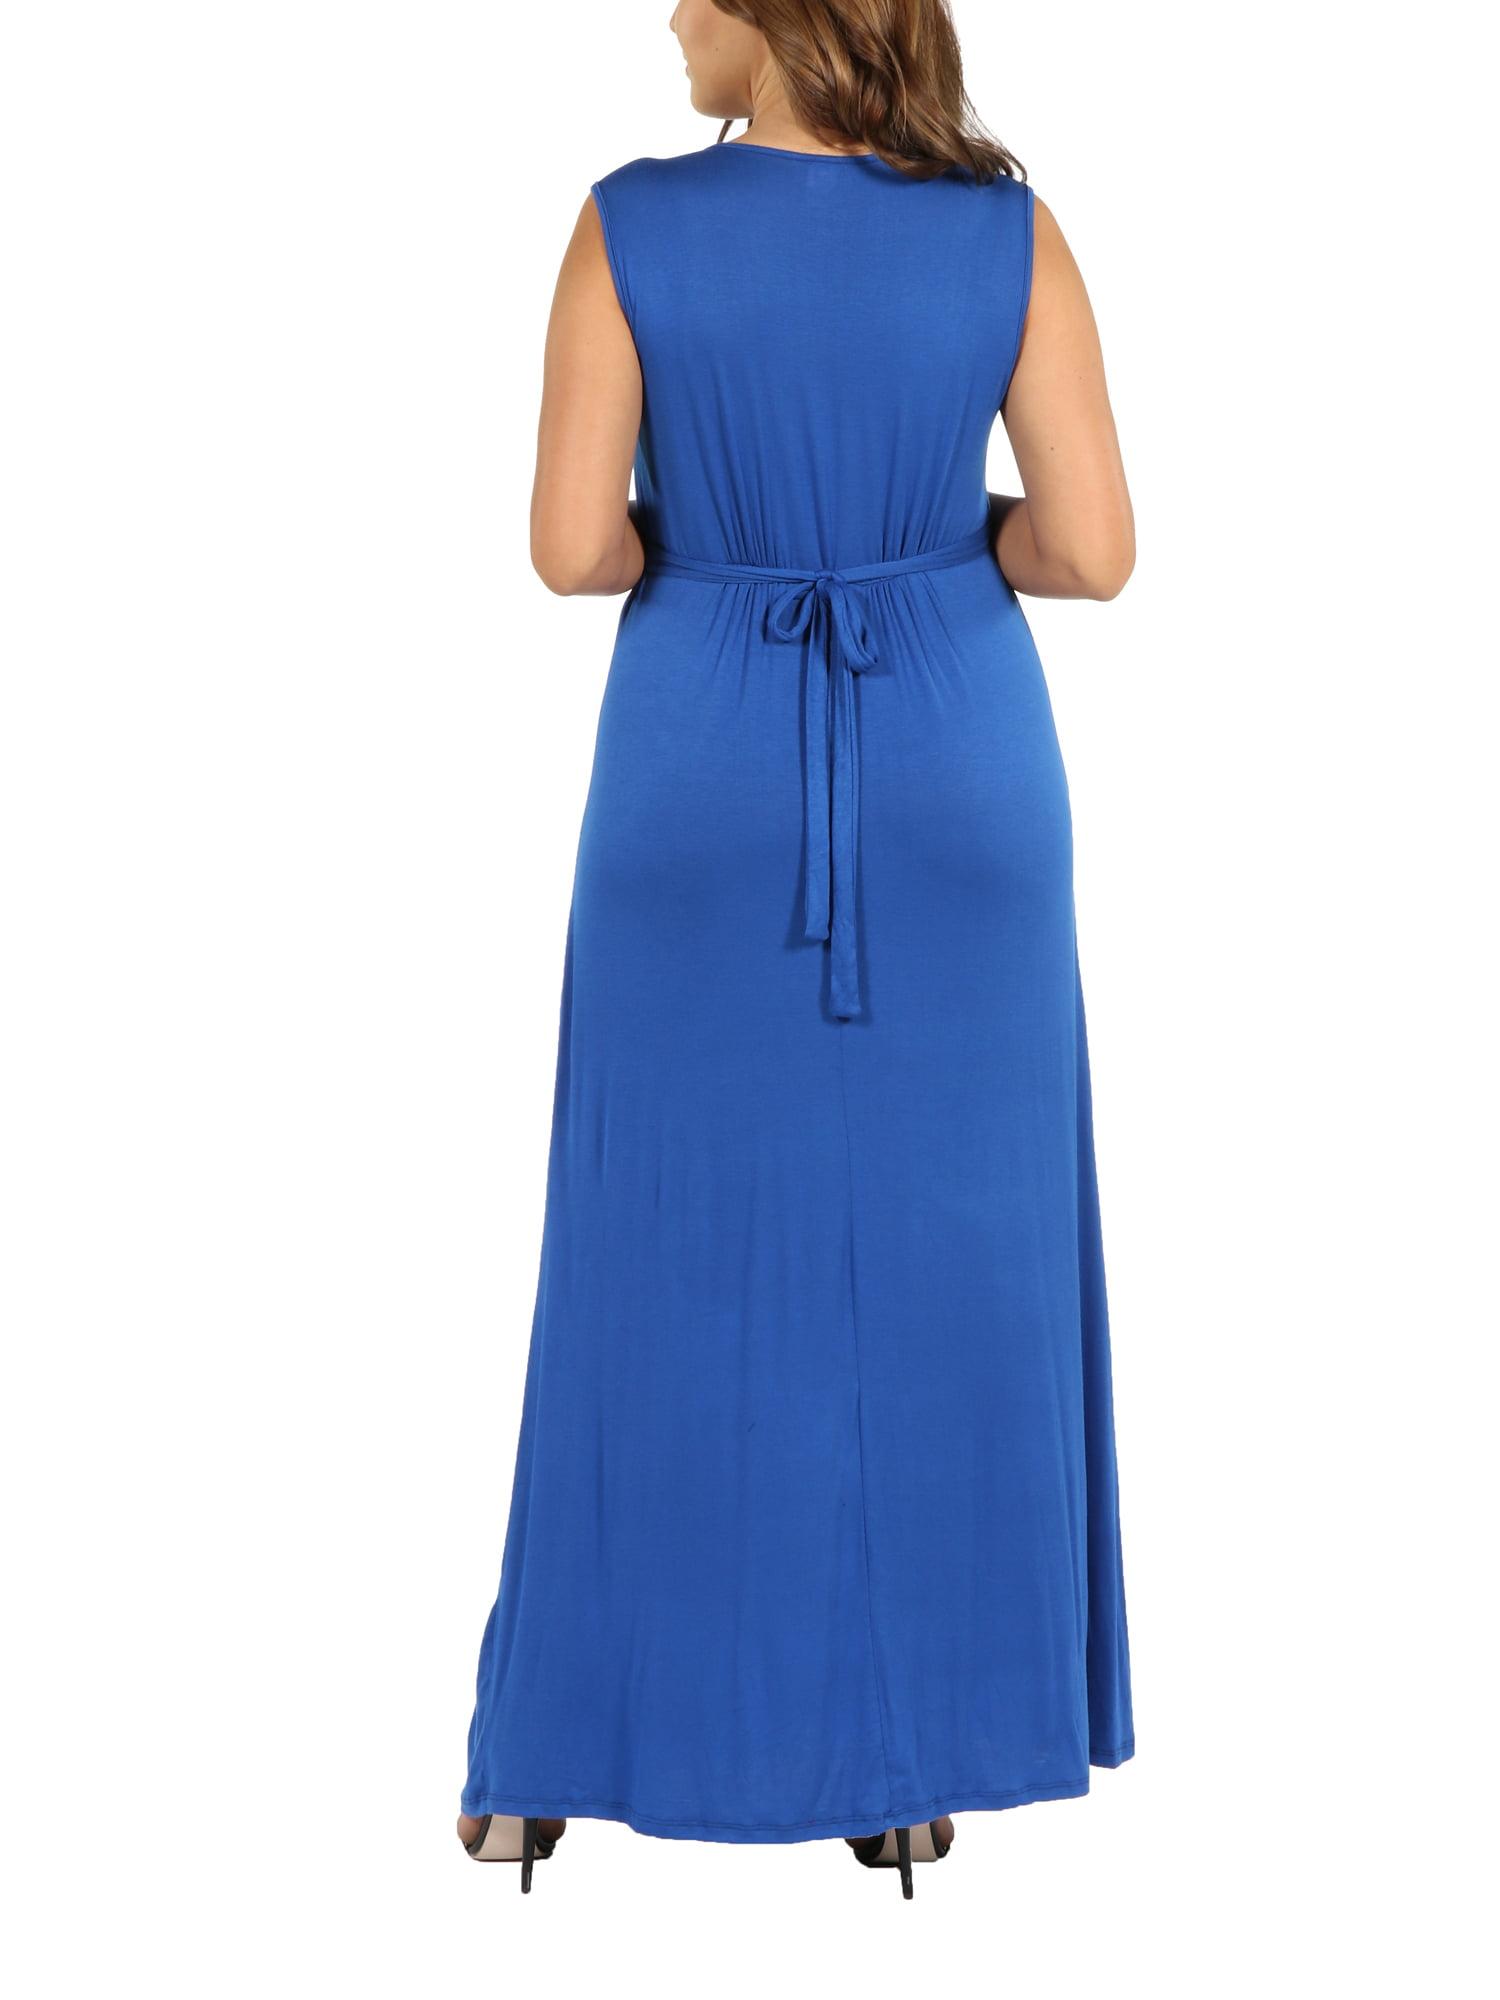 24/7 Comfort Apparel - Island Fire Plus Size Maxi Dress - Walmart.com